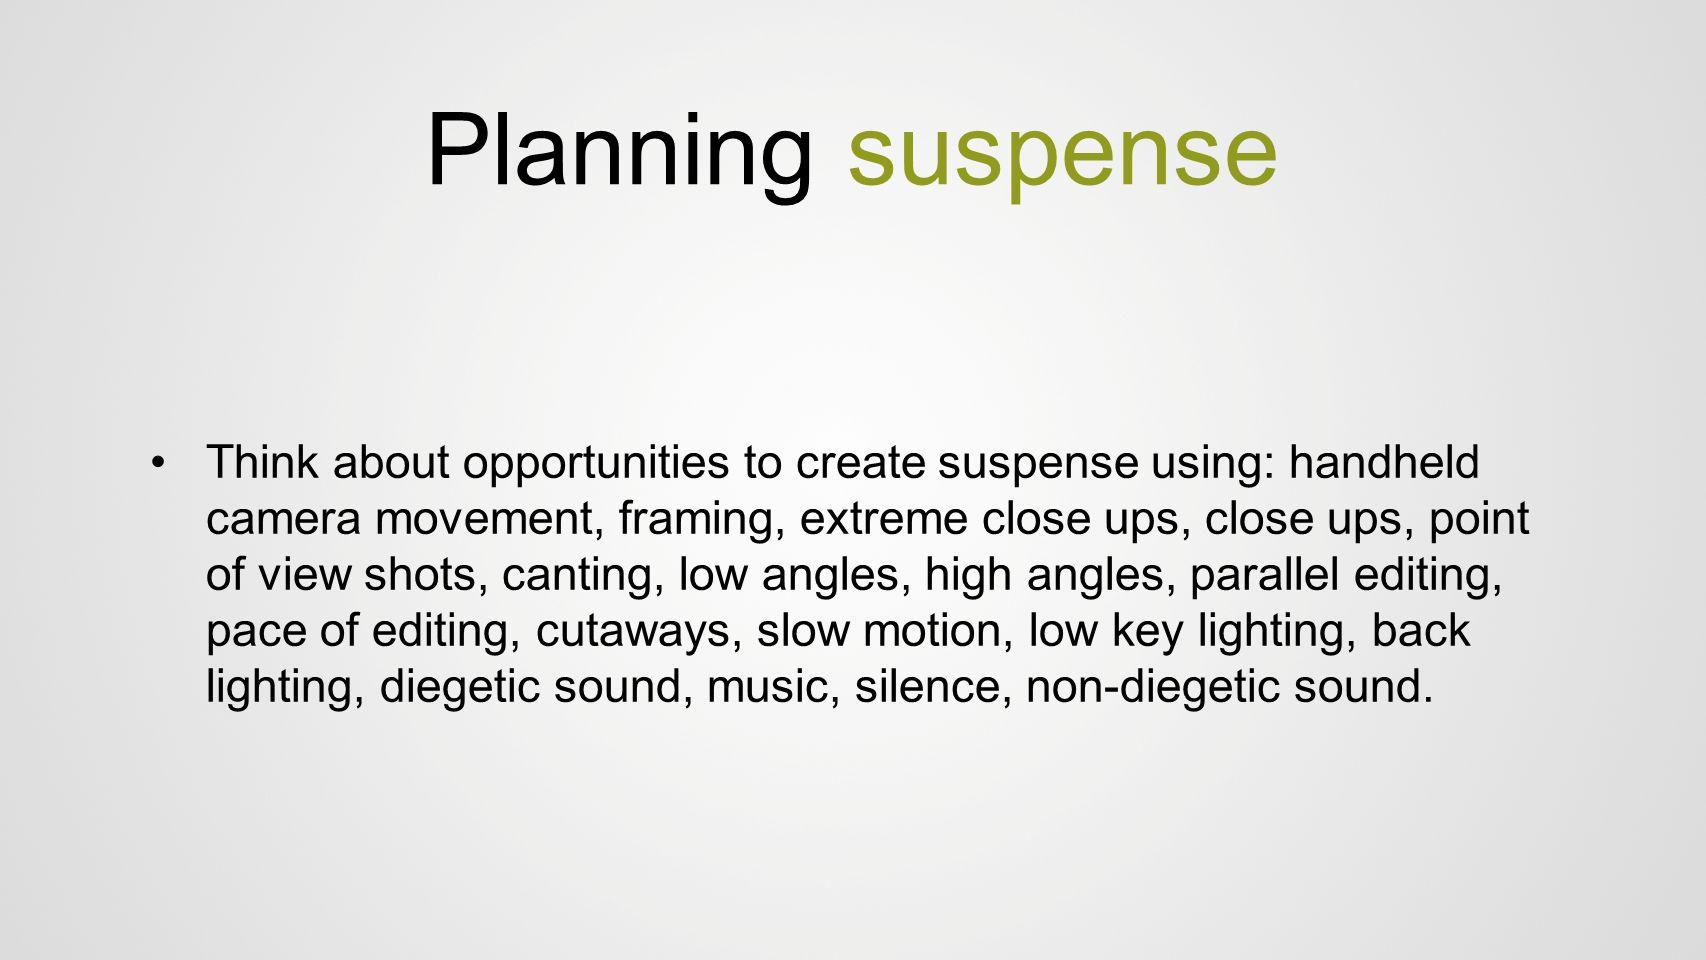 Planning suspense